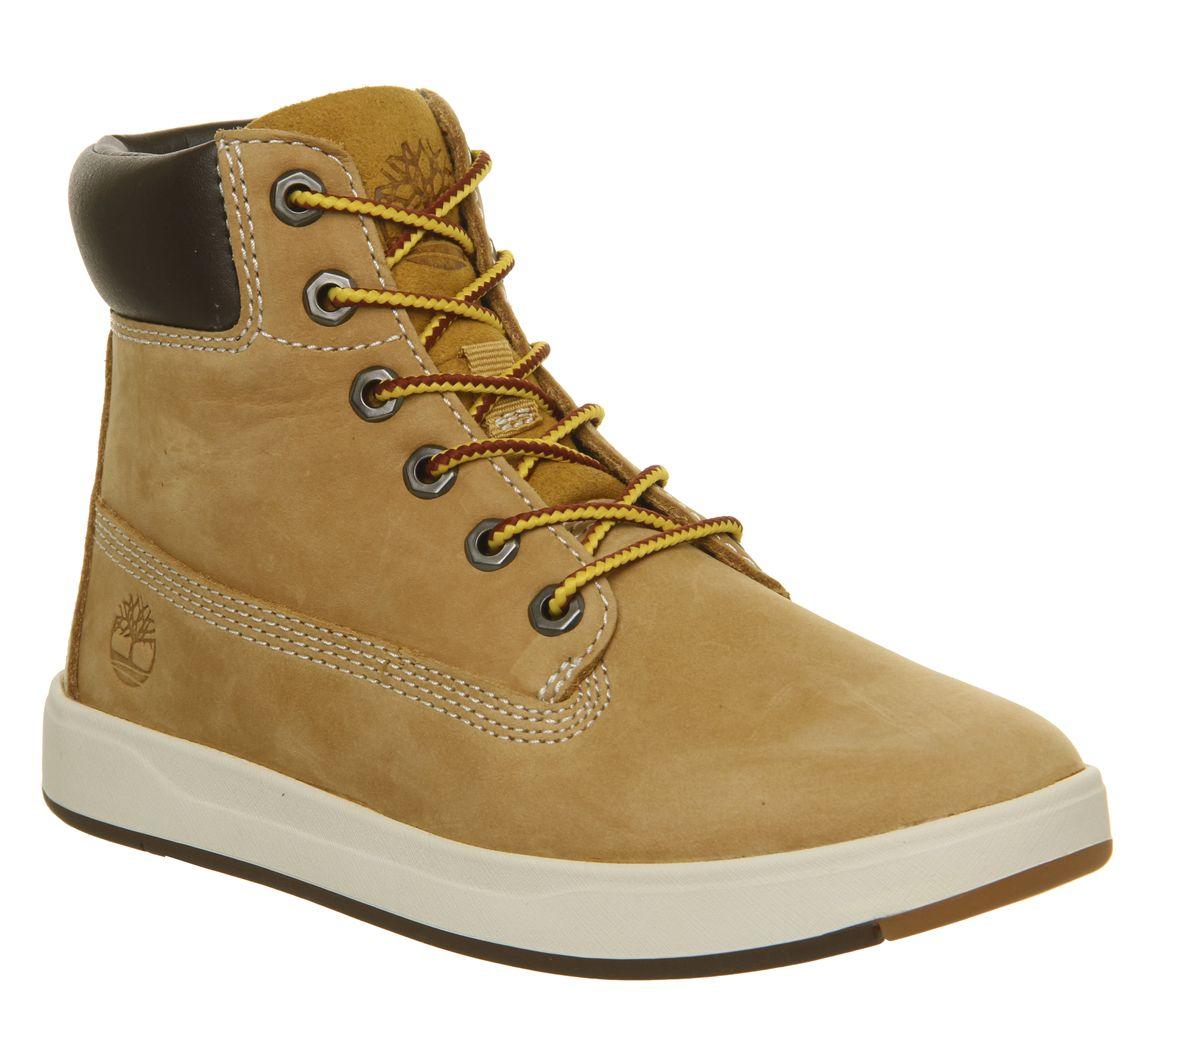 d6cee50d1b626 Timberland Davis Sqaure 6 Inch Boots Youth Wheat Naturebuck - Unisex